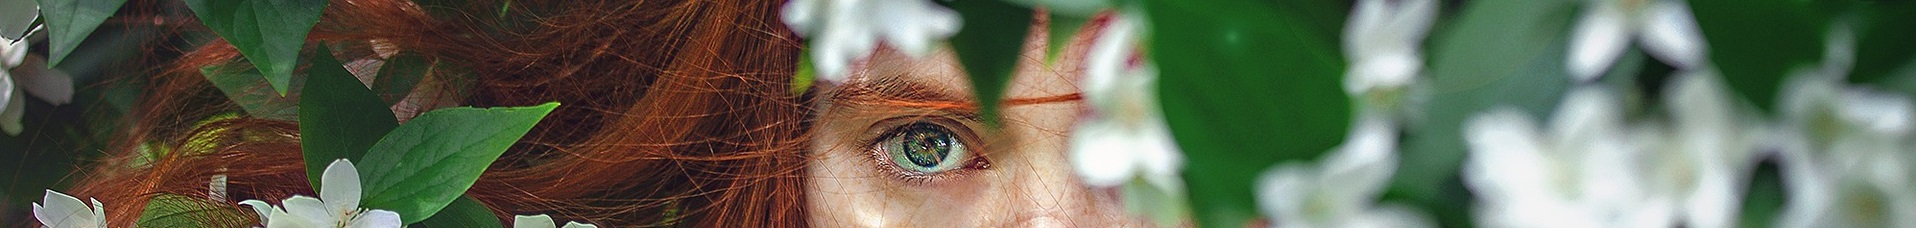 Корейский крем для глаз для молодой кожи